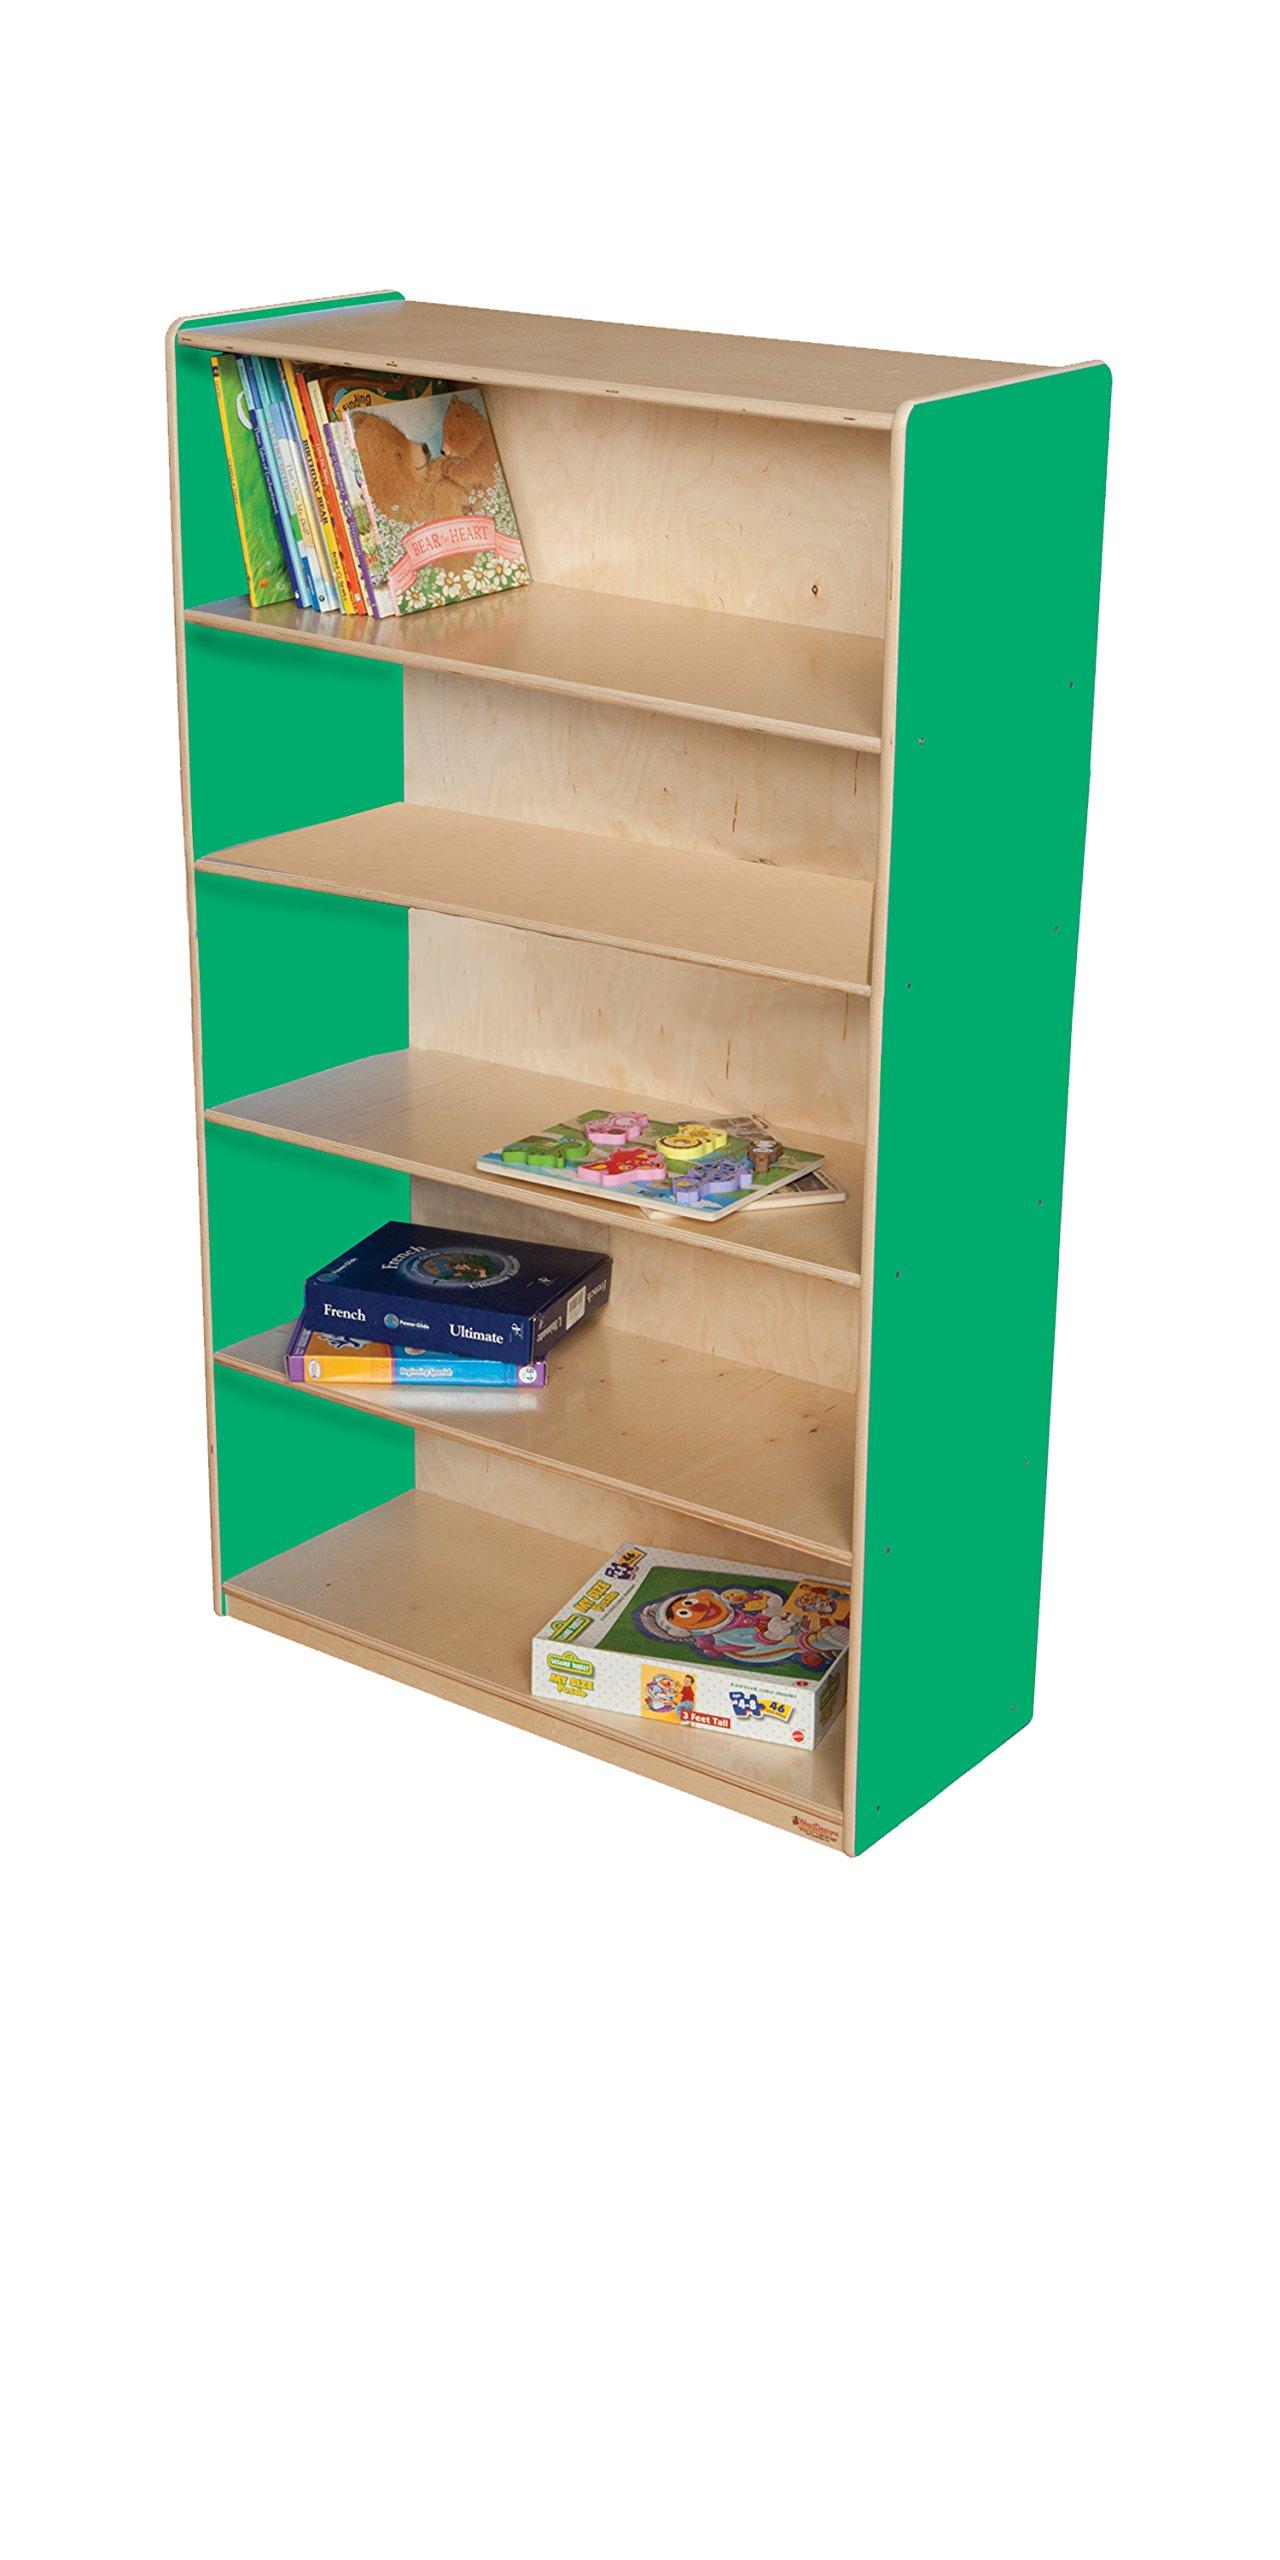 Wood Designs WD12960G Bookshelf, 60 x 36 x 15'' (H x W x D), Green Apple Color